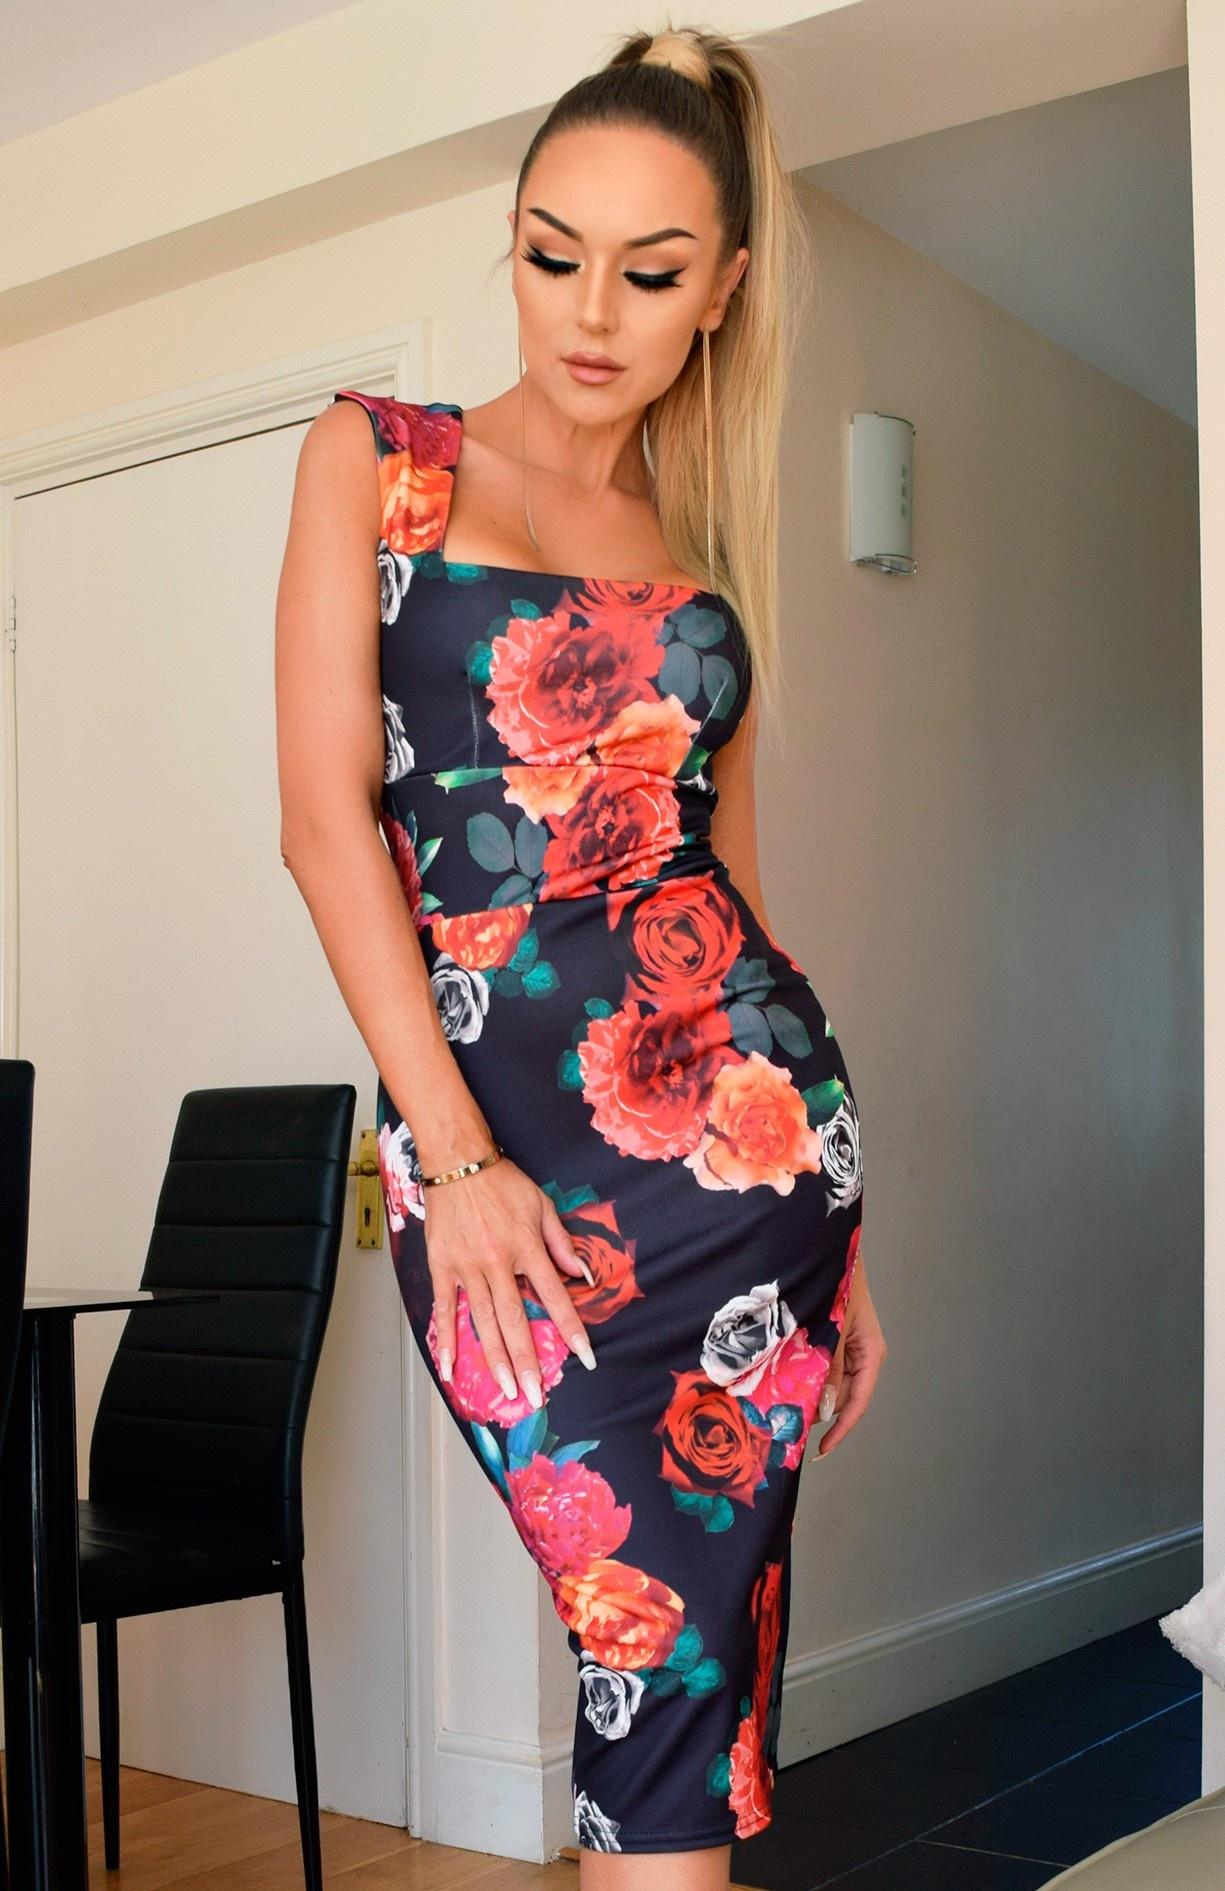 Alisha Floral Bodycon Dress Black